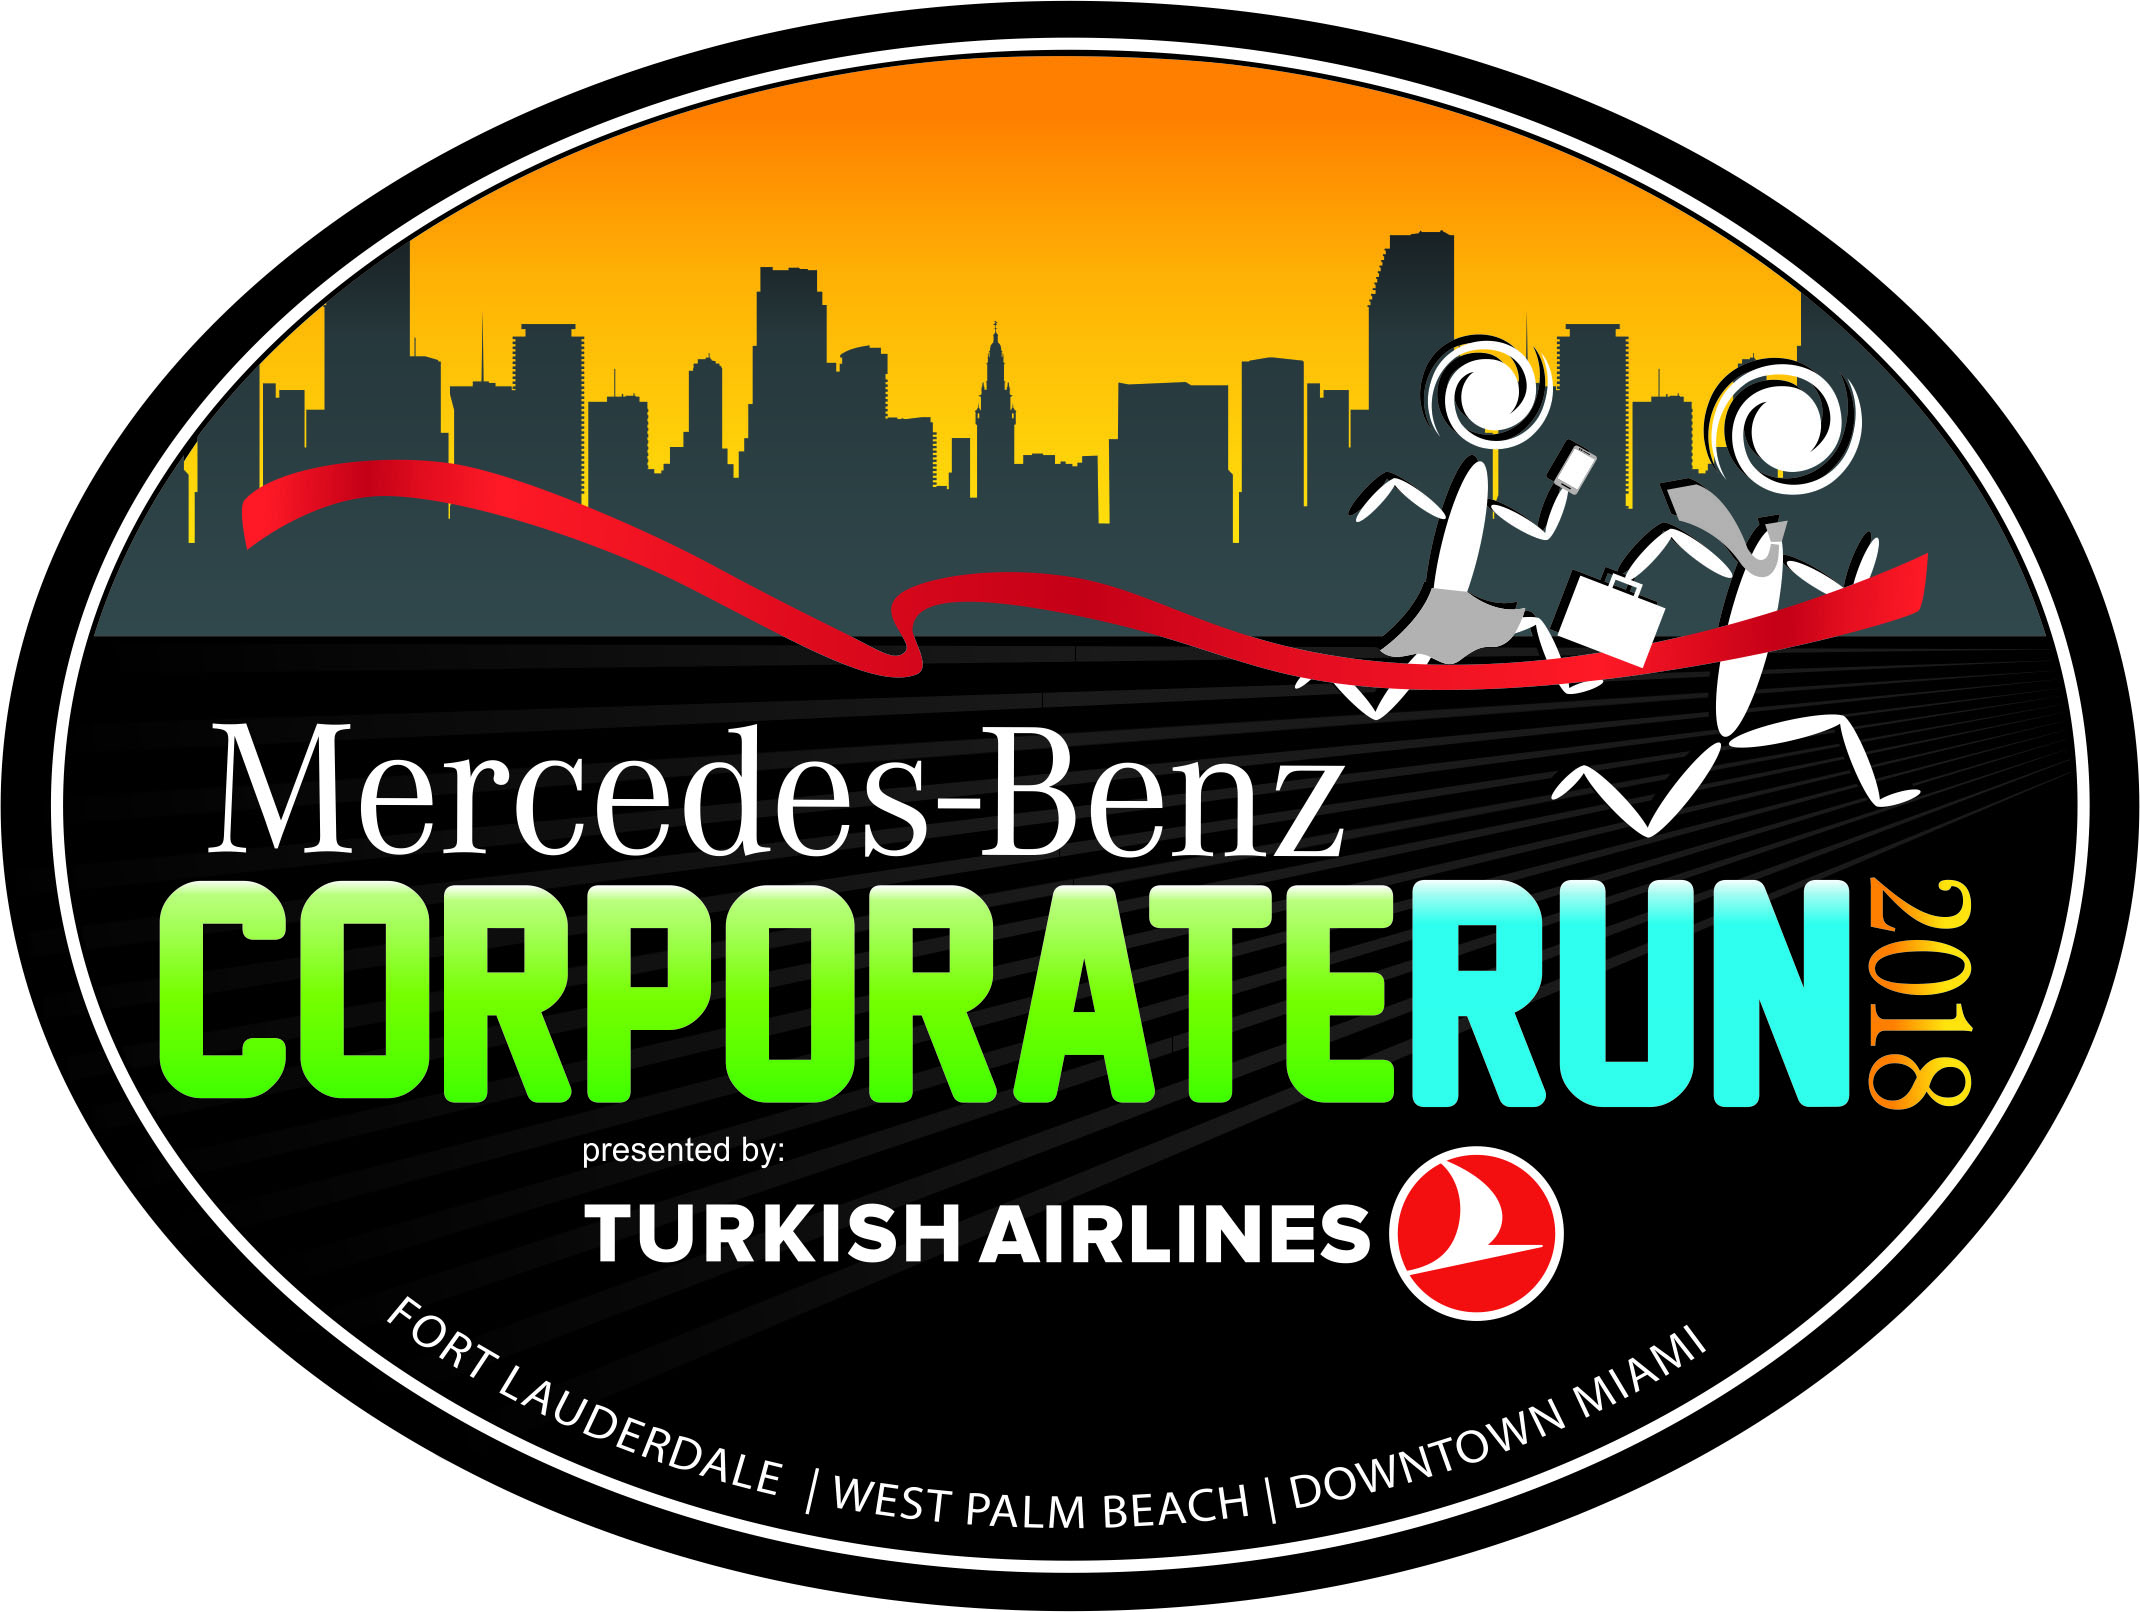 2018 Mercedes Benz Corporate Run Presented By Turkish Airlines U2013 West Palm  Beach Wednesday, 04/11/2018 U2013 06:45 Pm U2013 09:30 Pm